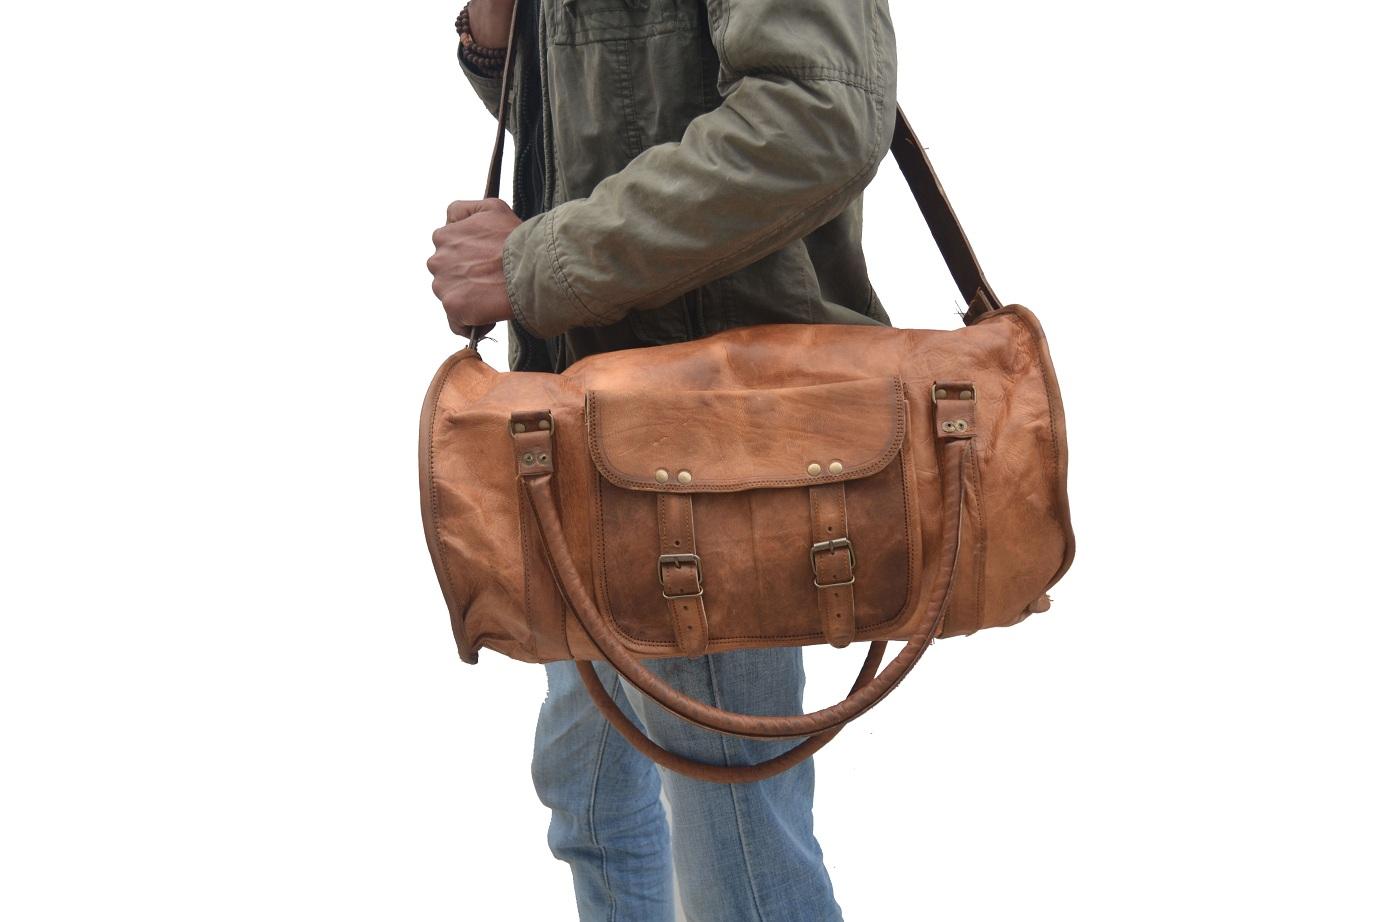 d8d98ecbfa7 Genuine 24″ Leather Travel Bag